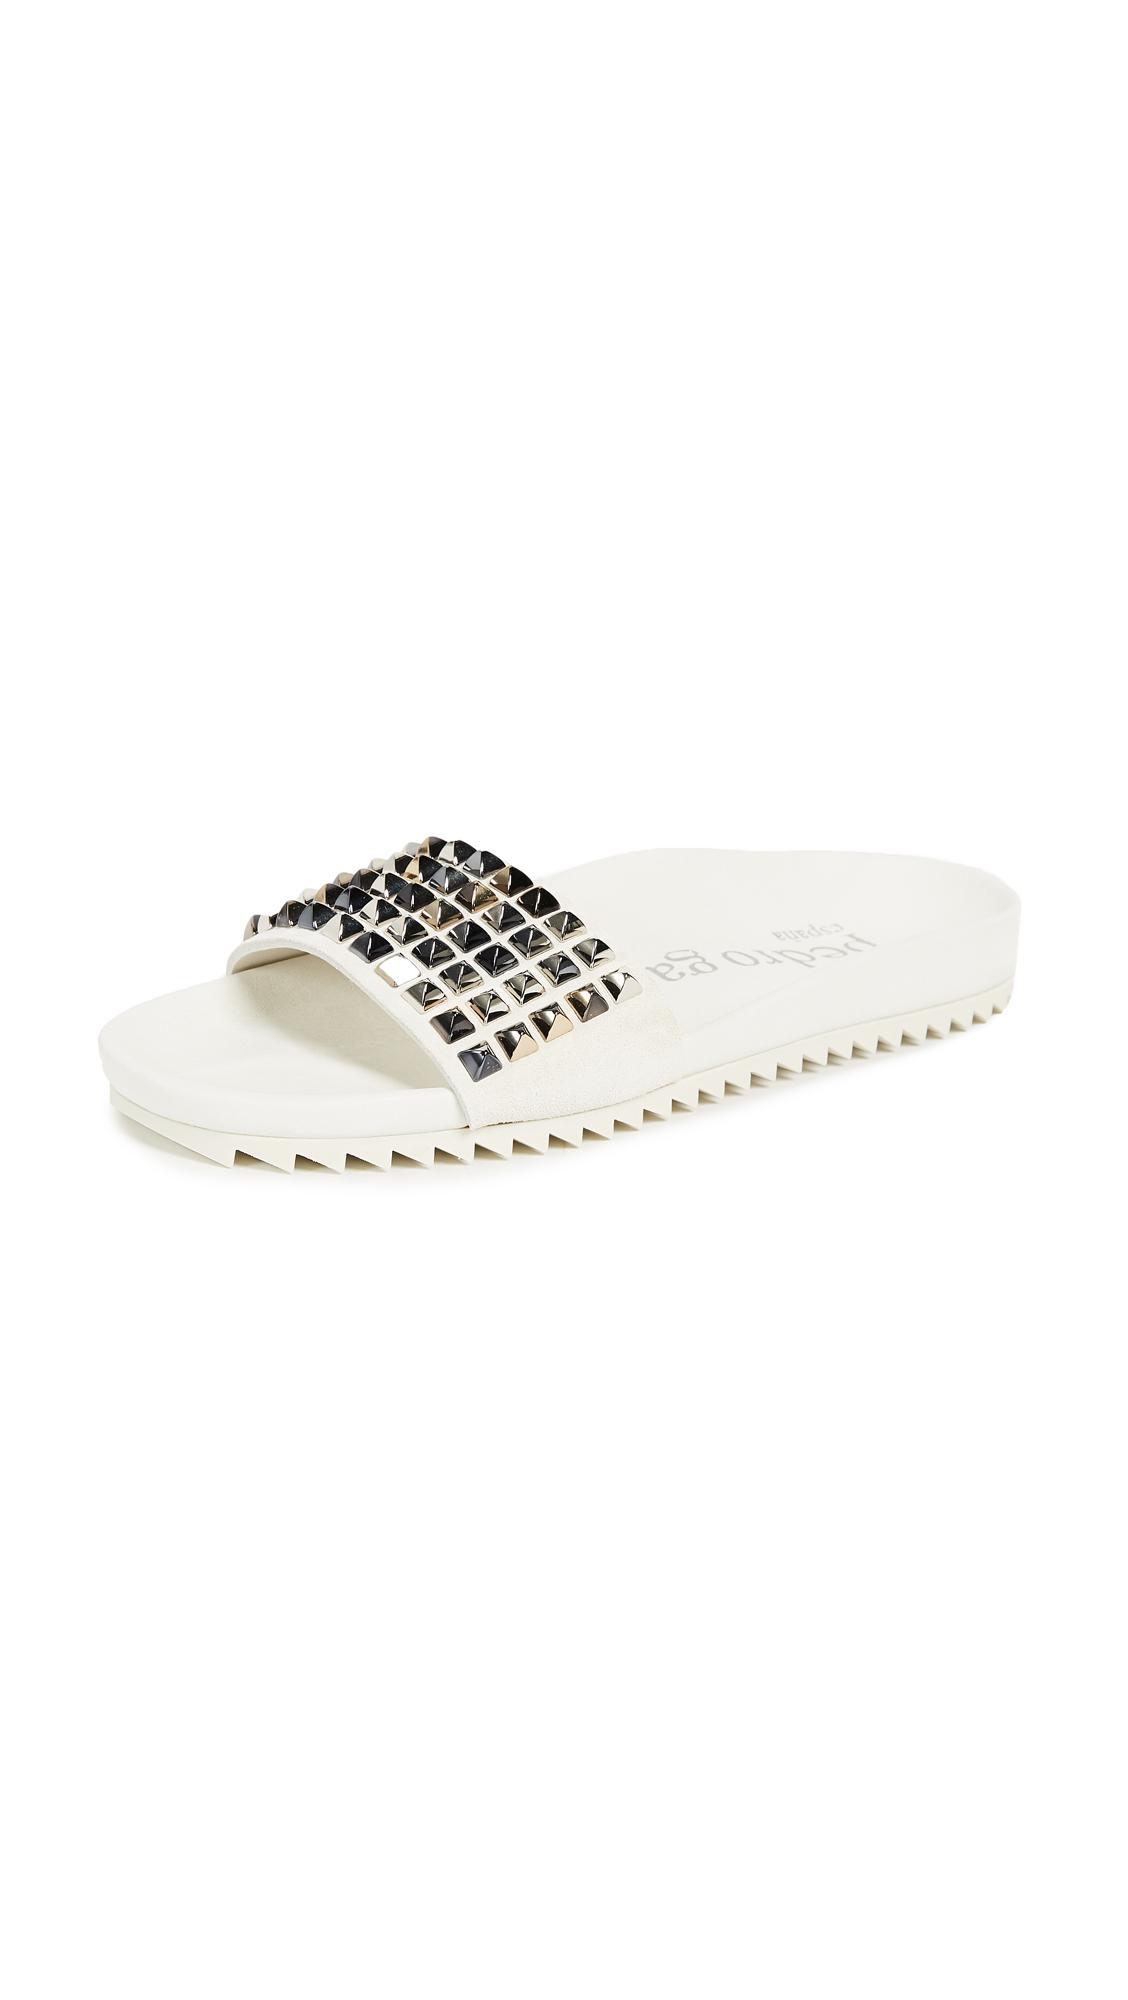 Photo of Pedro Garcia Ama Slide - buy Pedro Garcia shoes